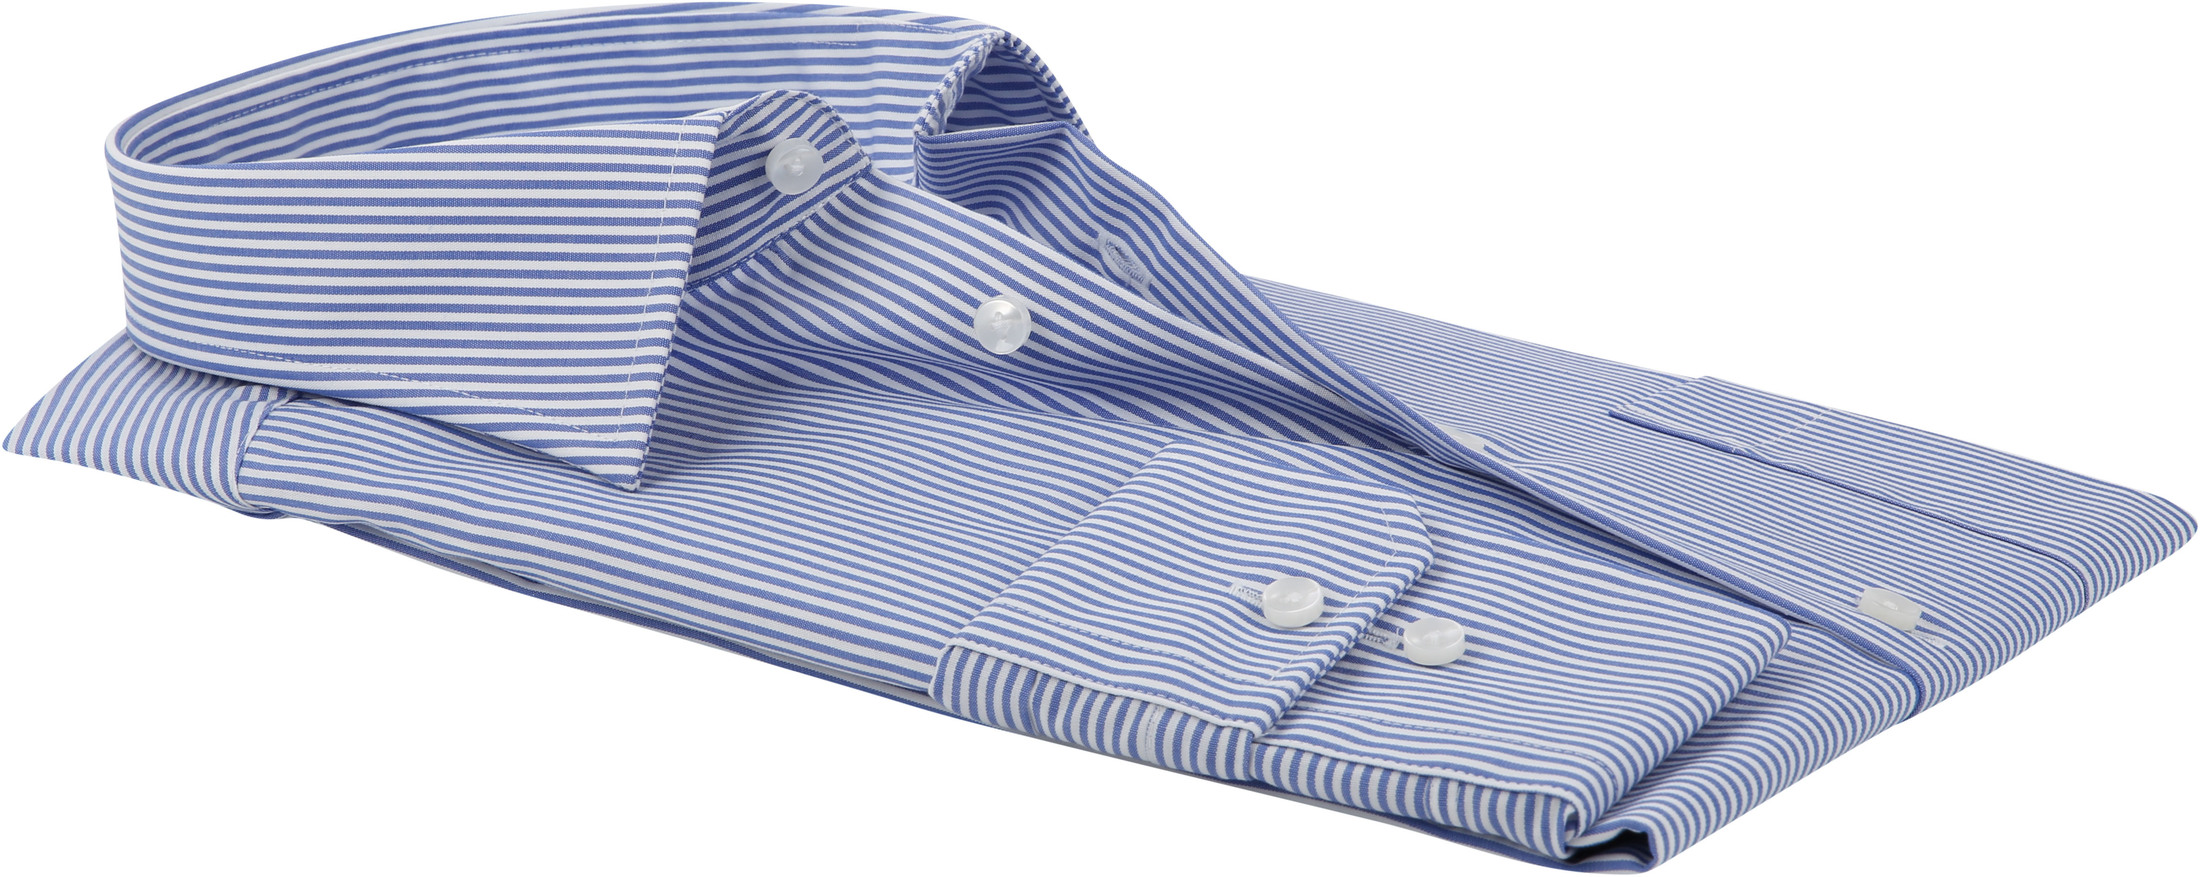 Seidensticker Splendesto Blue White Striped